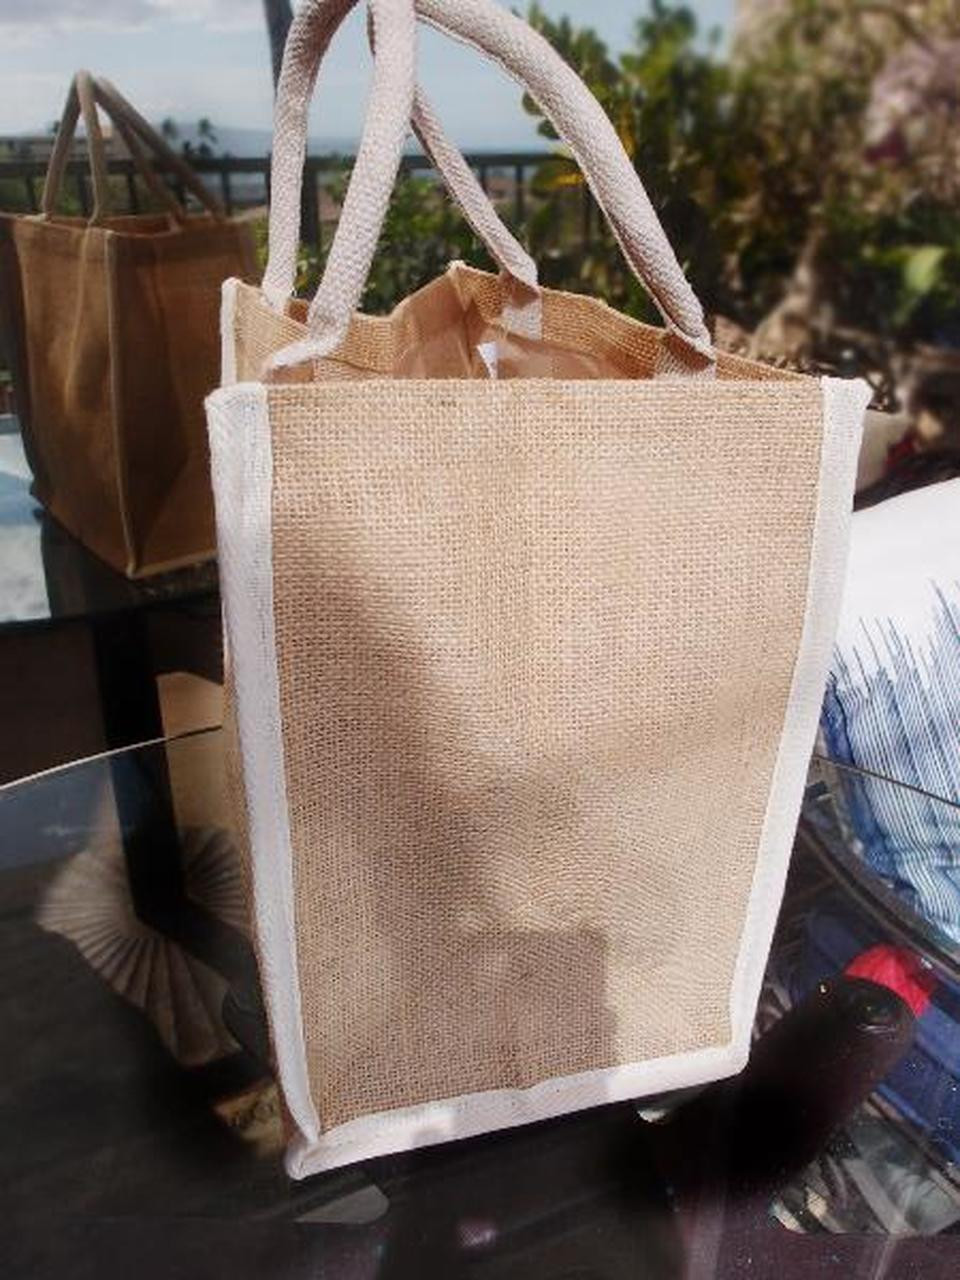 "Wholesale Burlap Tote Bags, Jute Tote Bag with White Cotton Trim 12"" W x 12"" H x 7 3/4"" Gusset , B875-71"